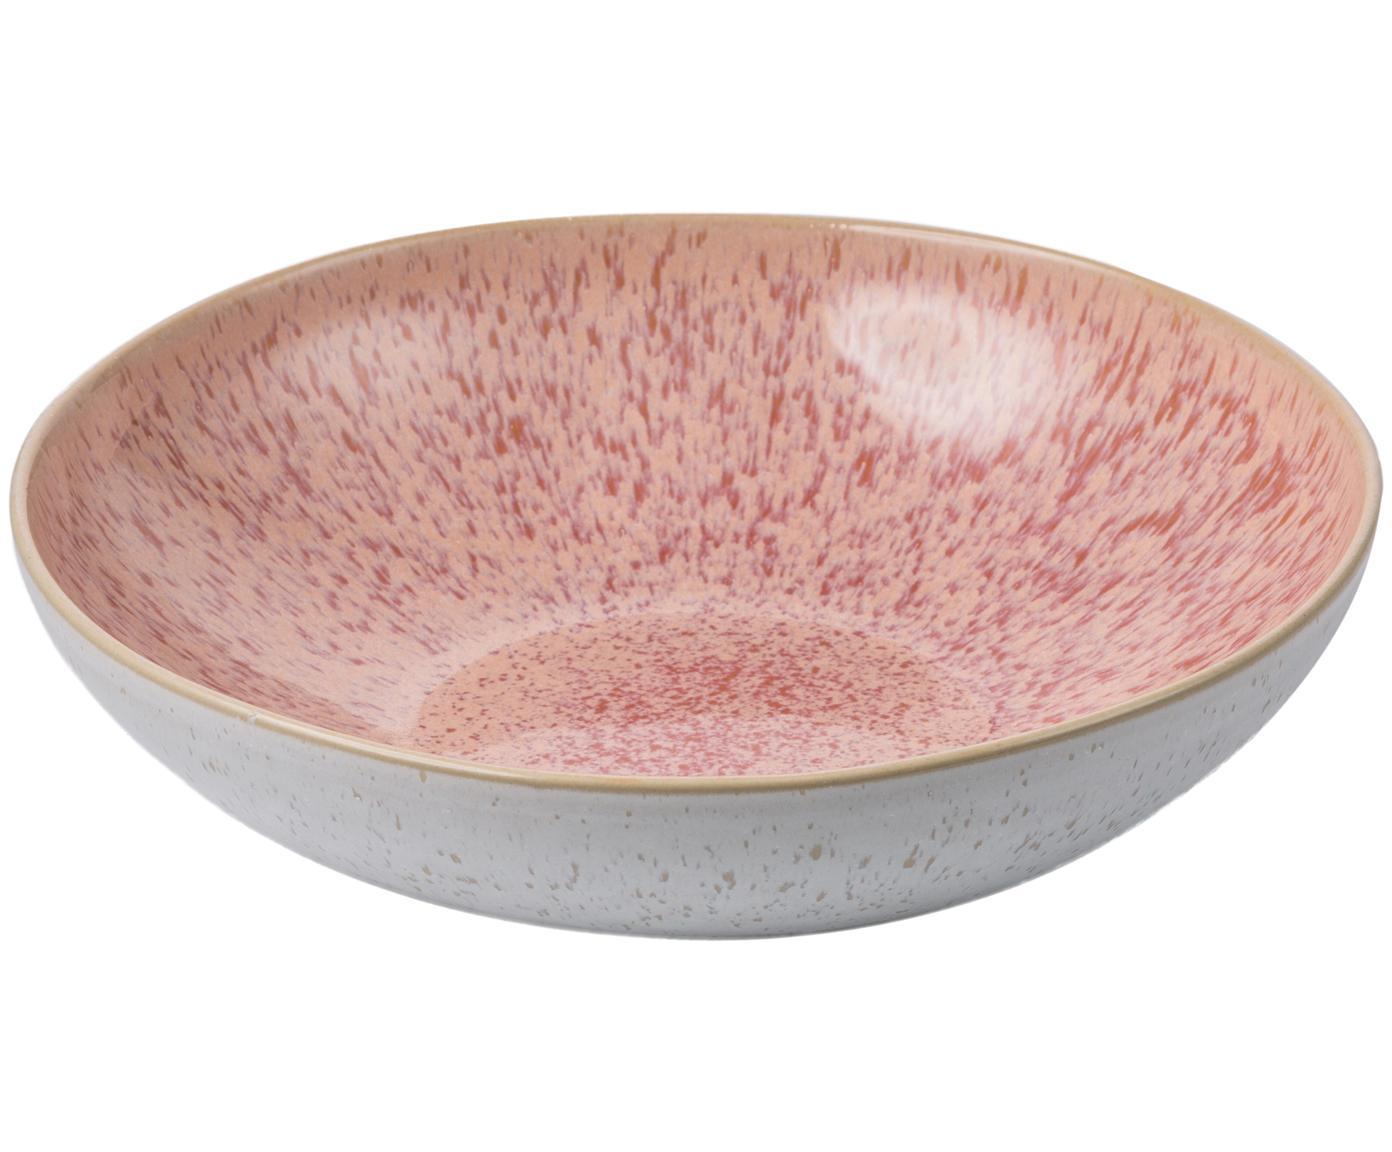 Ciotola dipinta a mano Areia, Terracotta, Tonalità rosse, bianco latteo, beige chiaro, Ø 22 x Alt. 5 cm